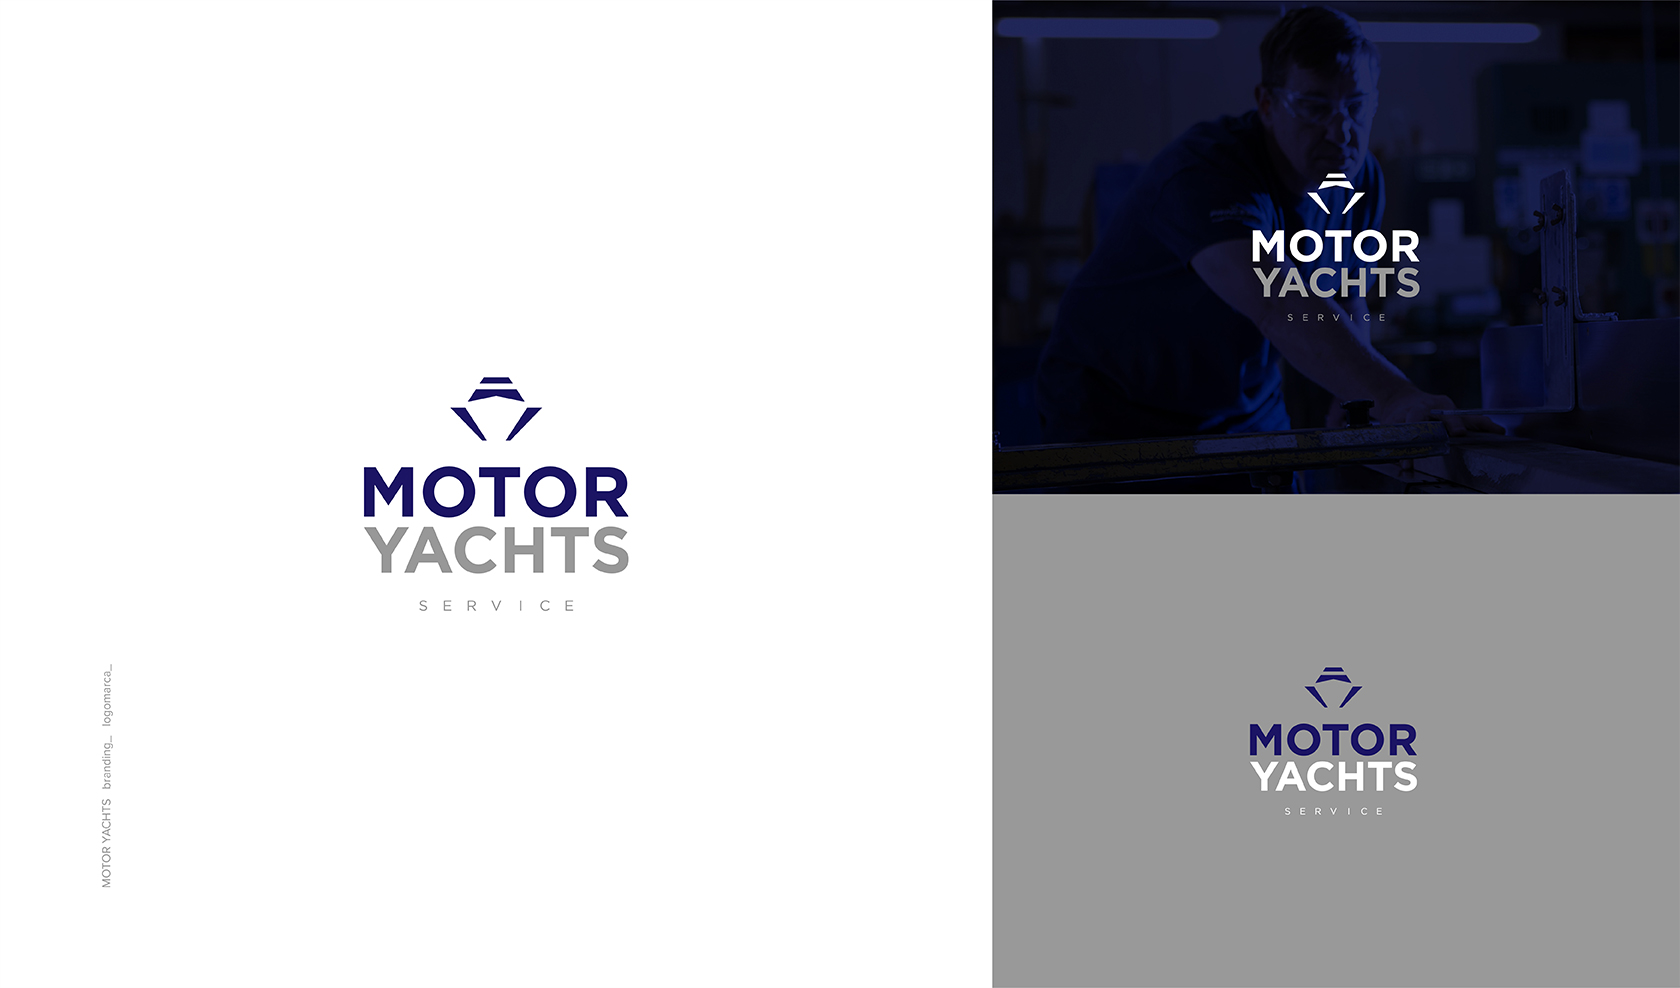 Motor Yachts Service